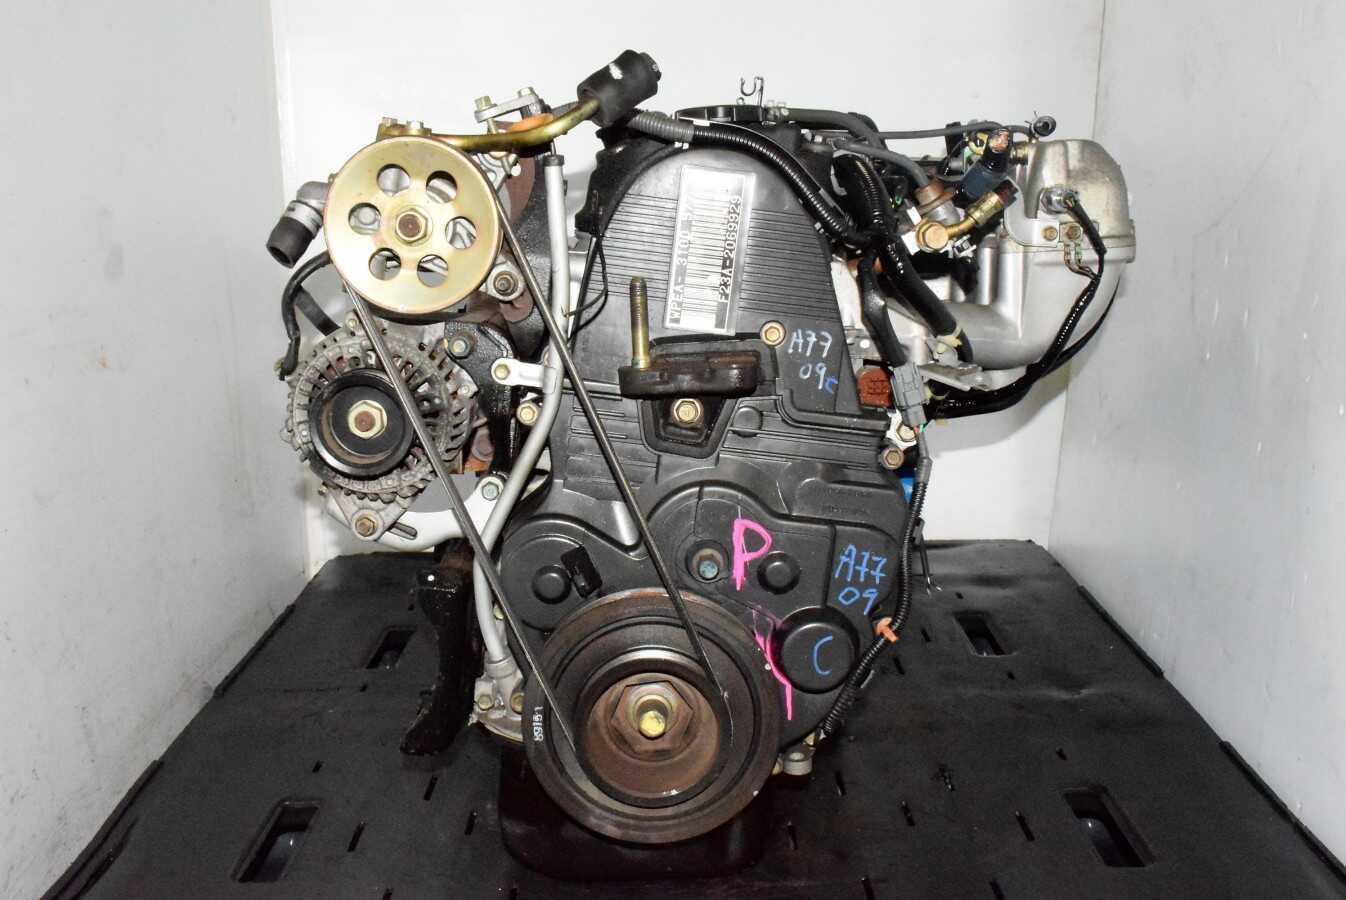 Low Mileage Jdm F23a Engine 2 3l Sohc Vtec Replacement For